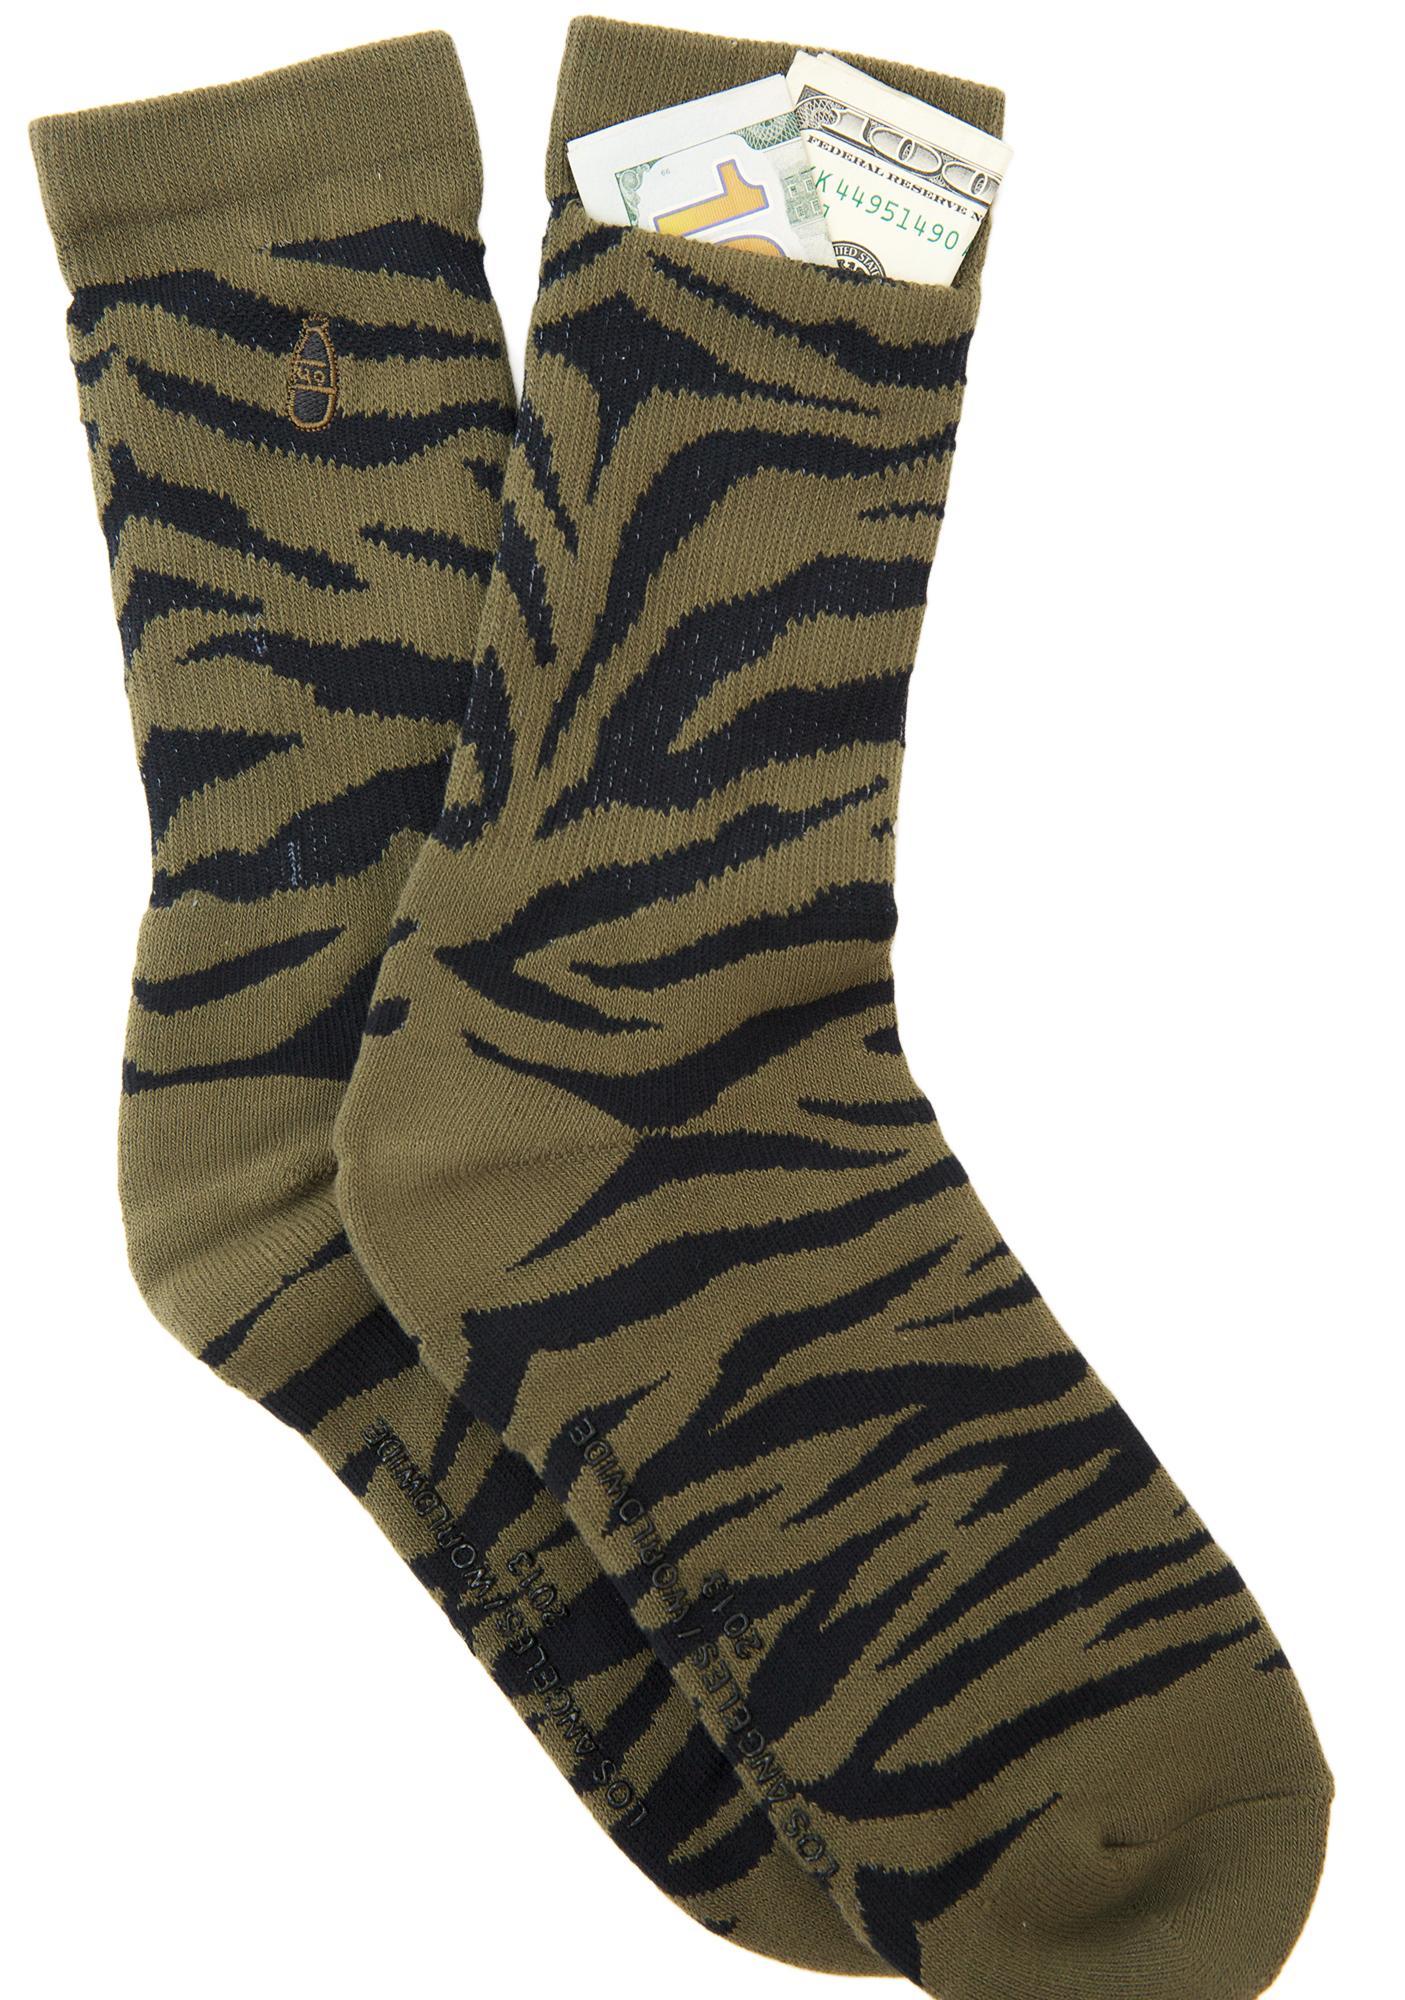 40s & Shorties Bravo Pocket Socks